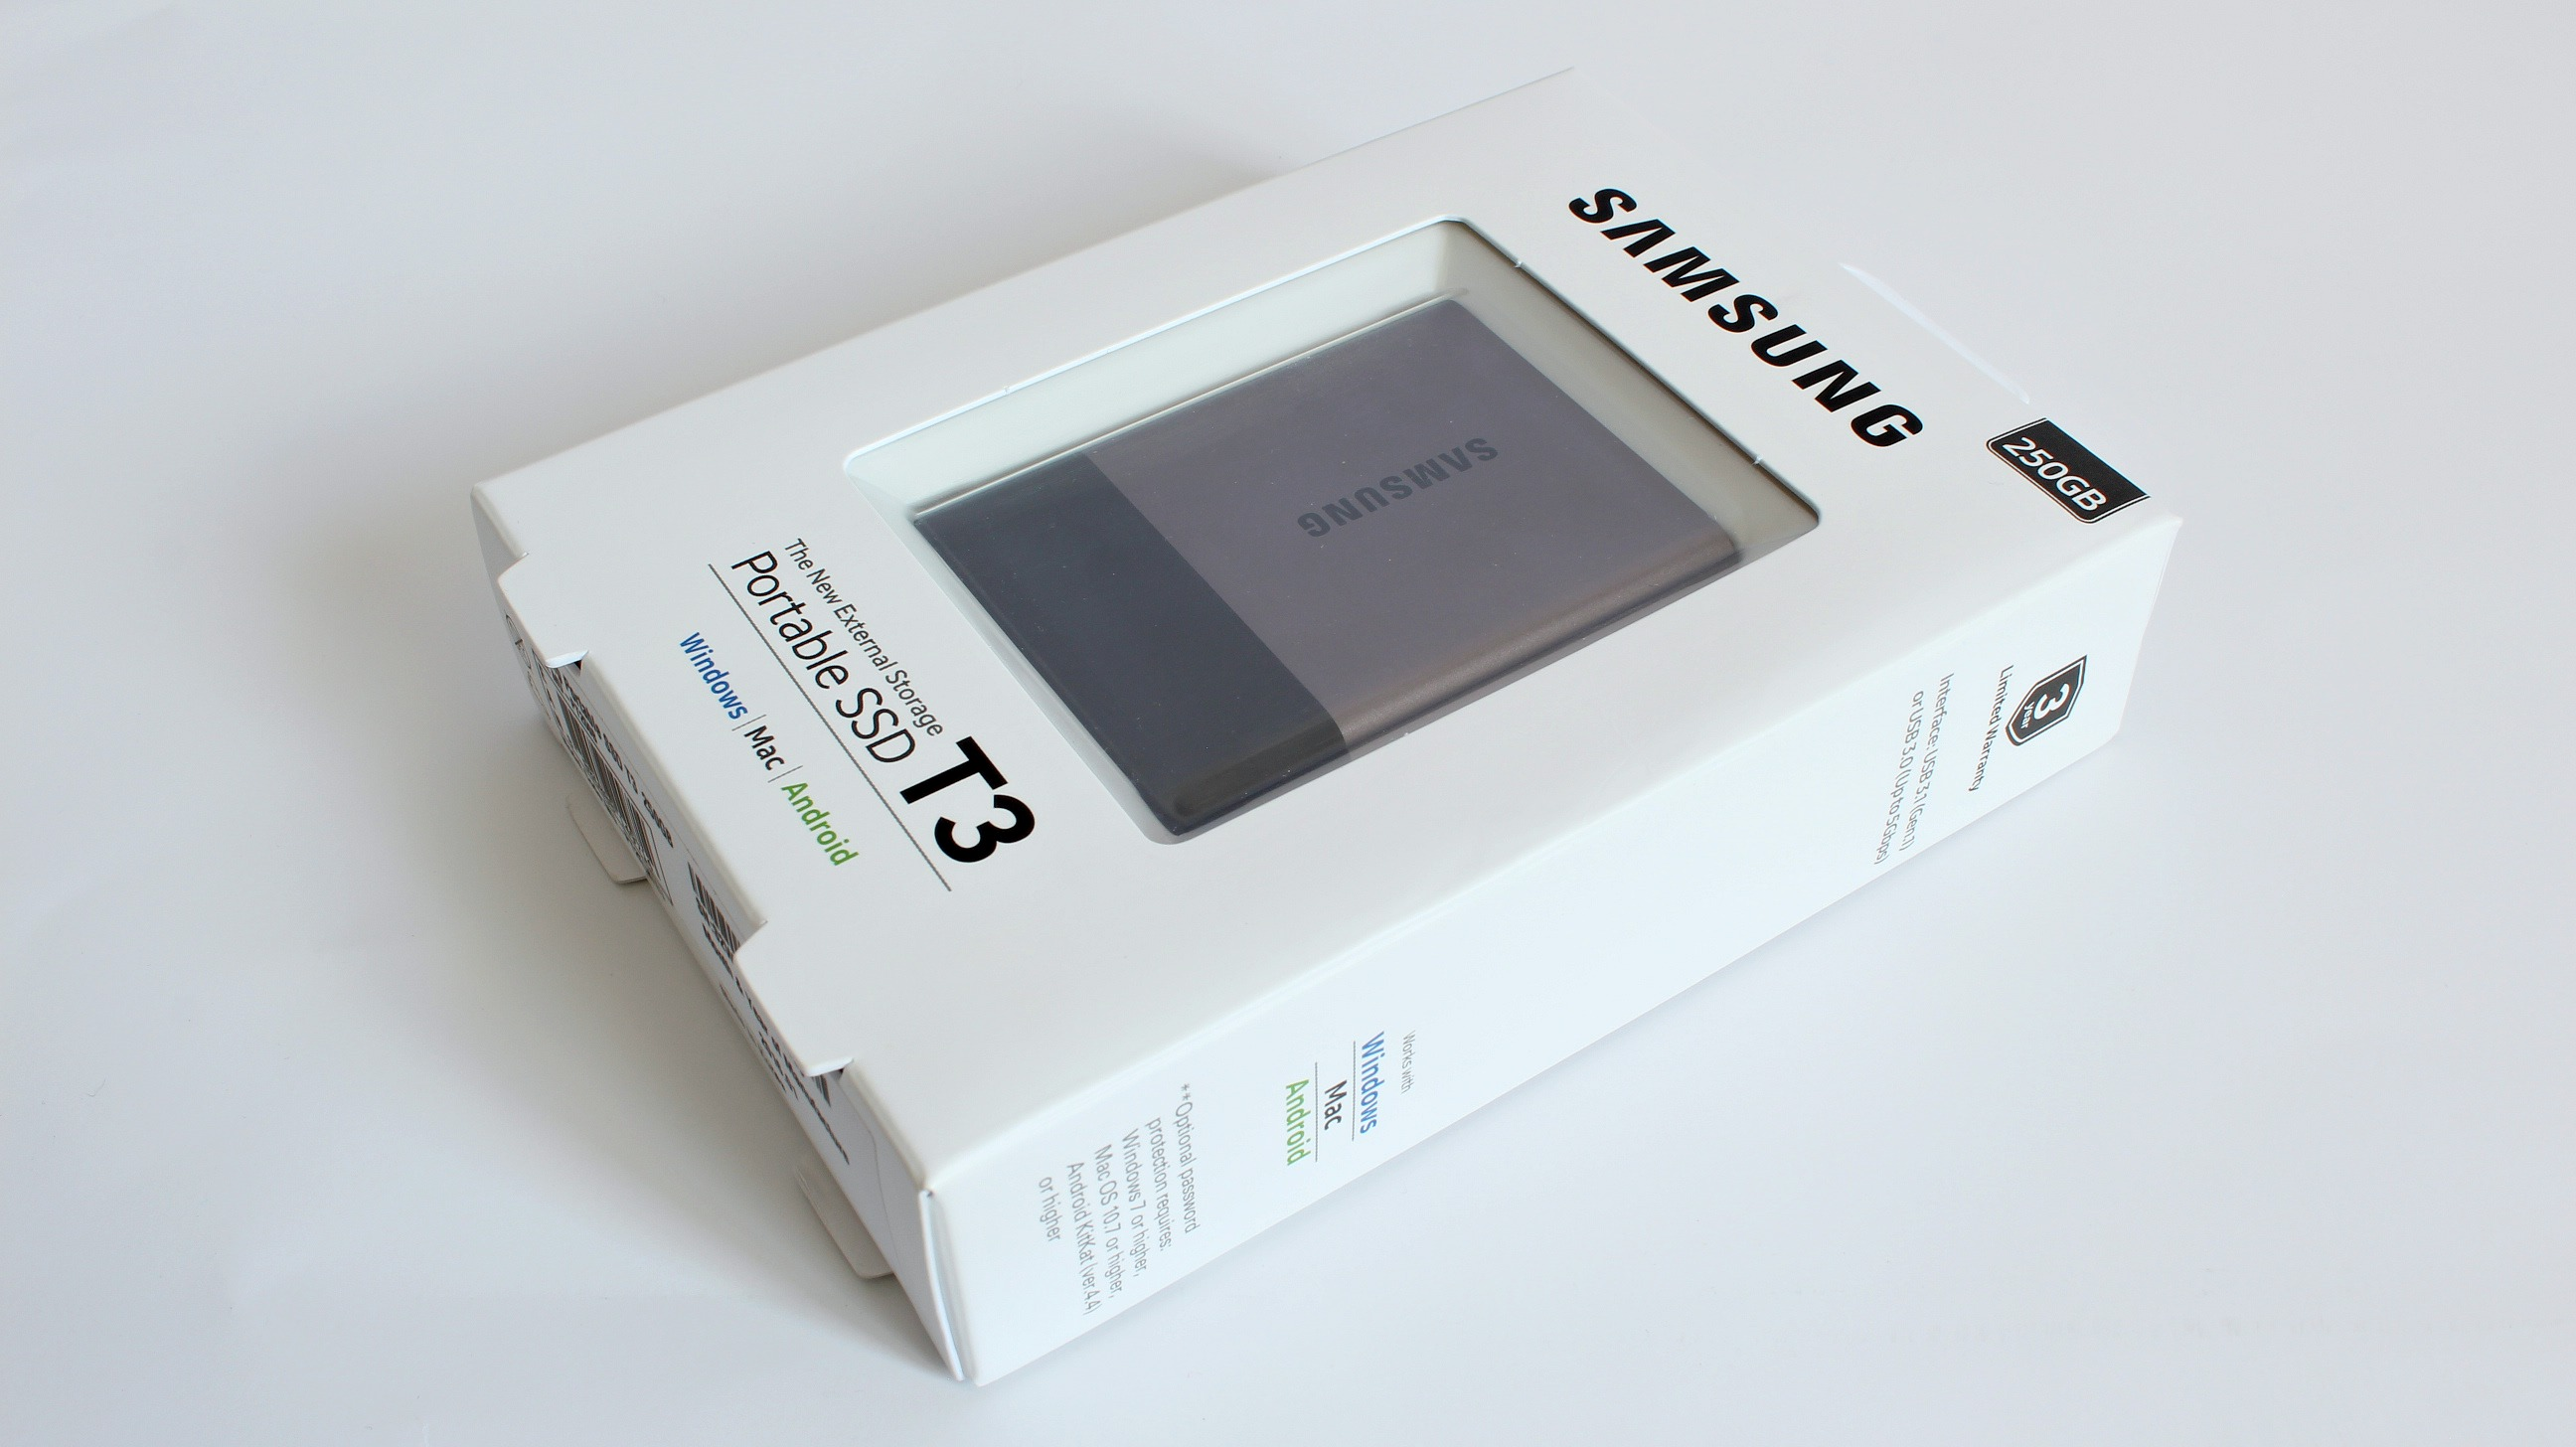 samsung-t3-250-gb-1